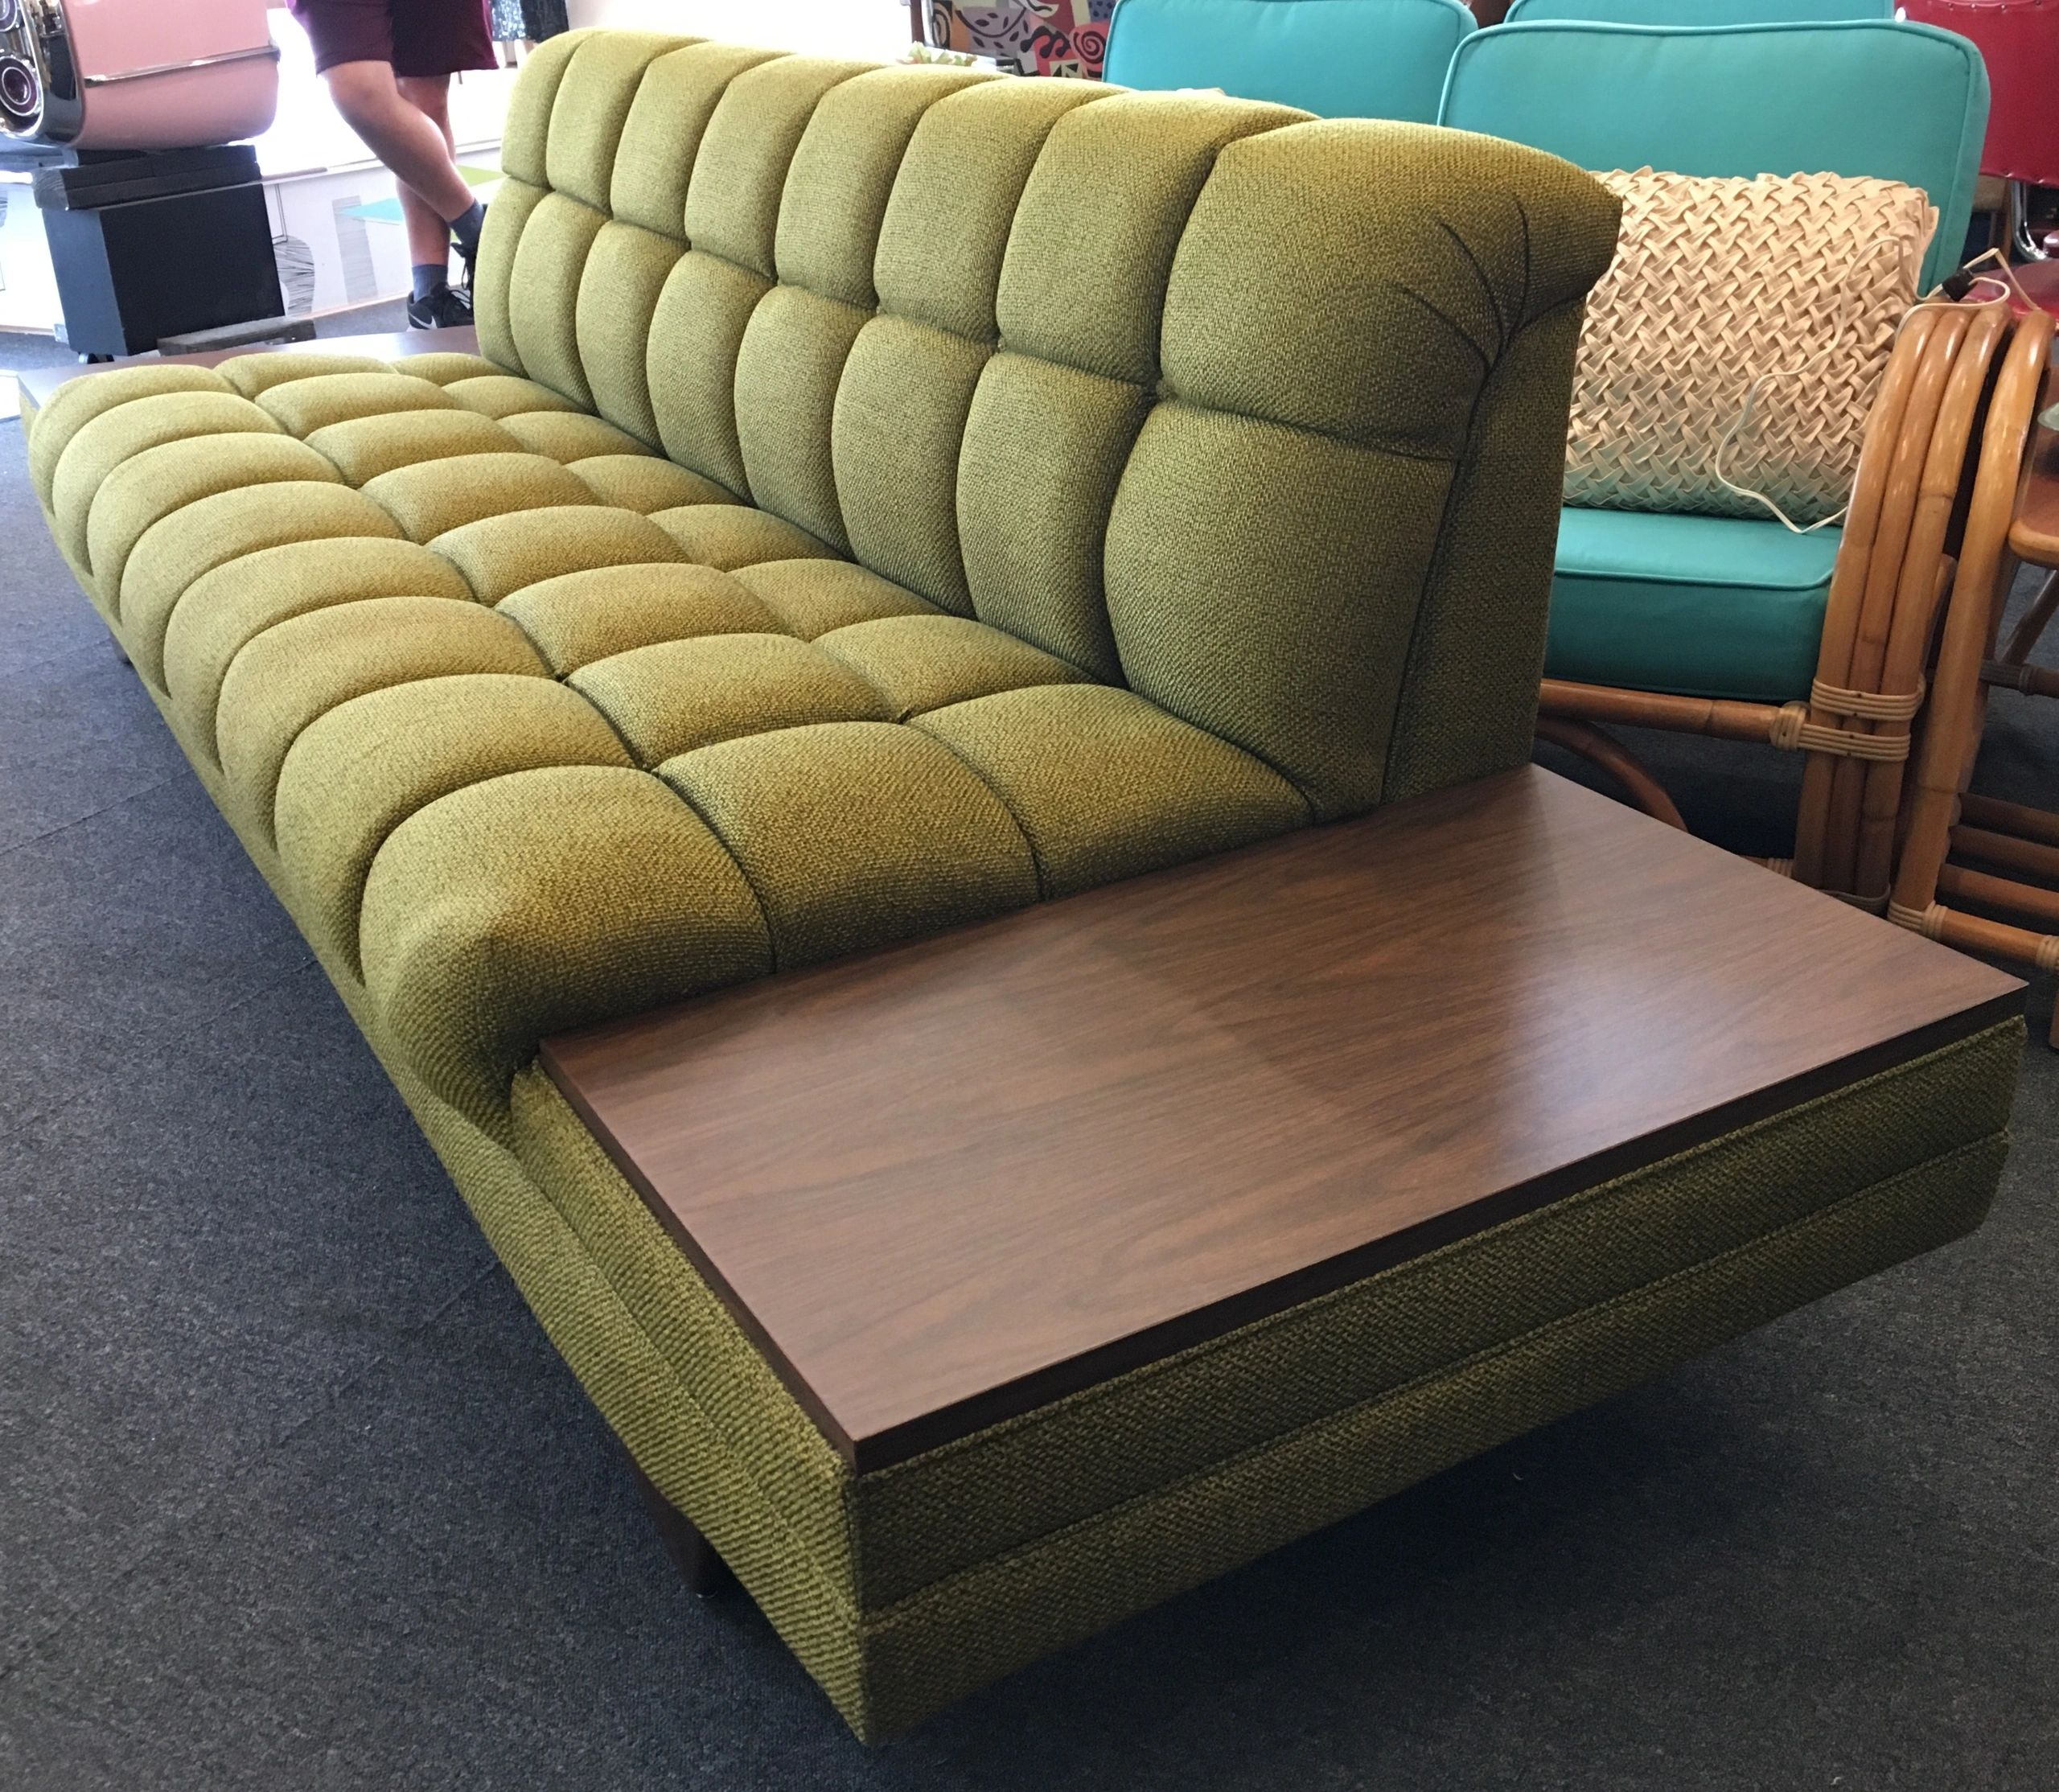 Peachy Tfa Mid Century Modern Furniture Mid Century Modern Home Interior And Landscaping Ferensignezvosmurscom